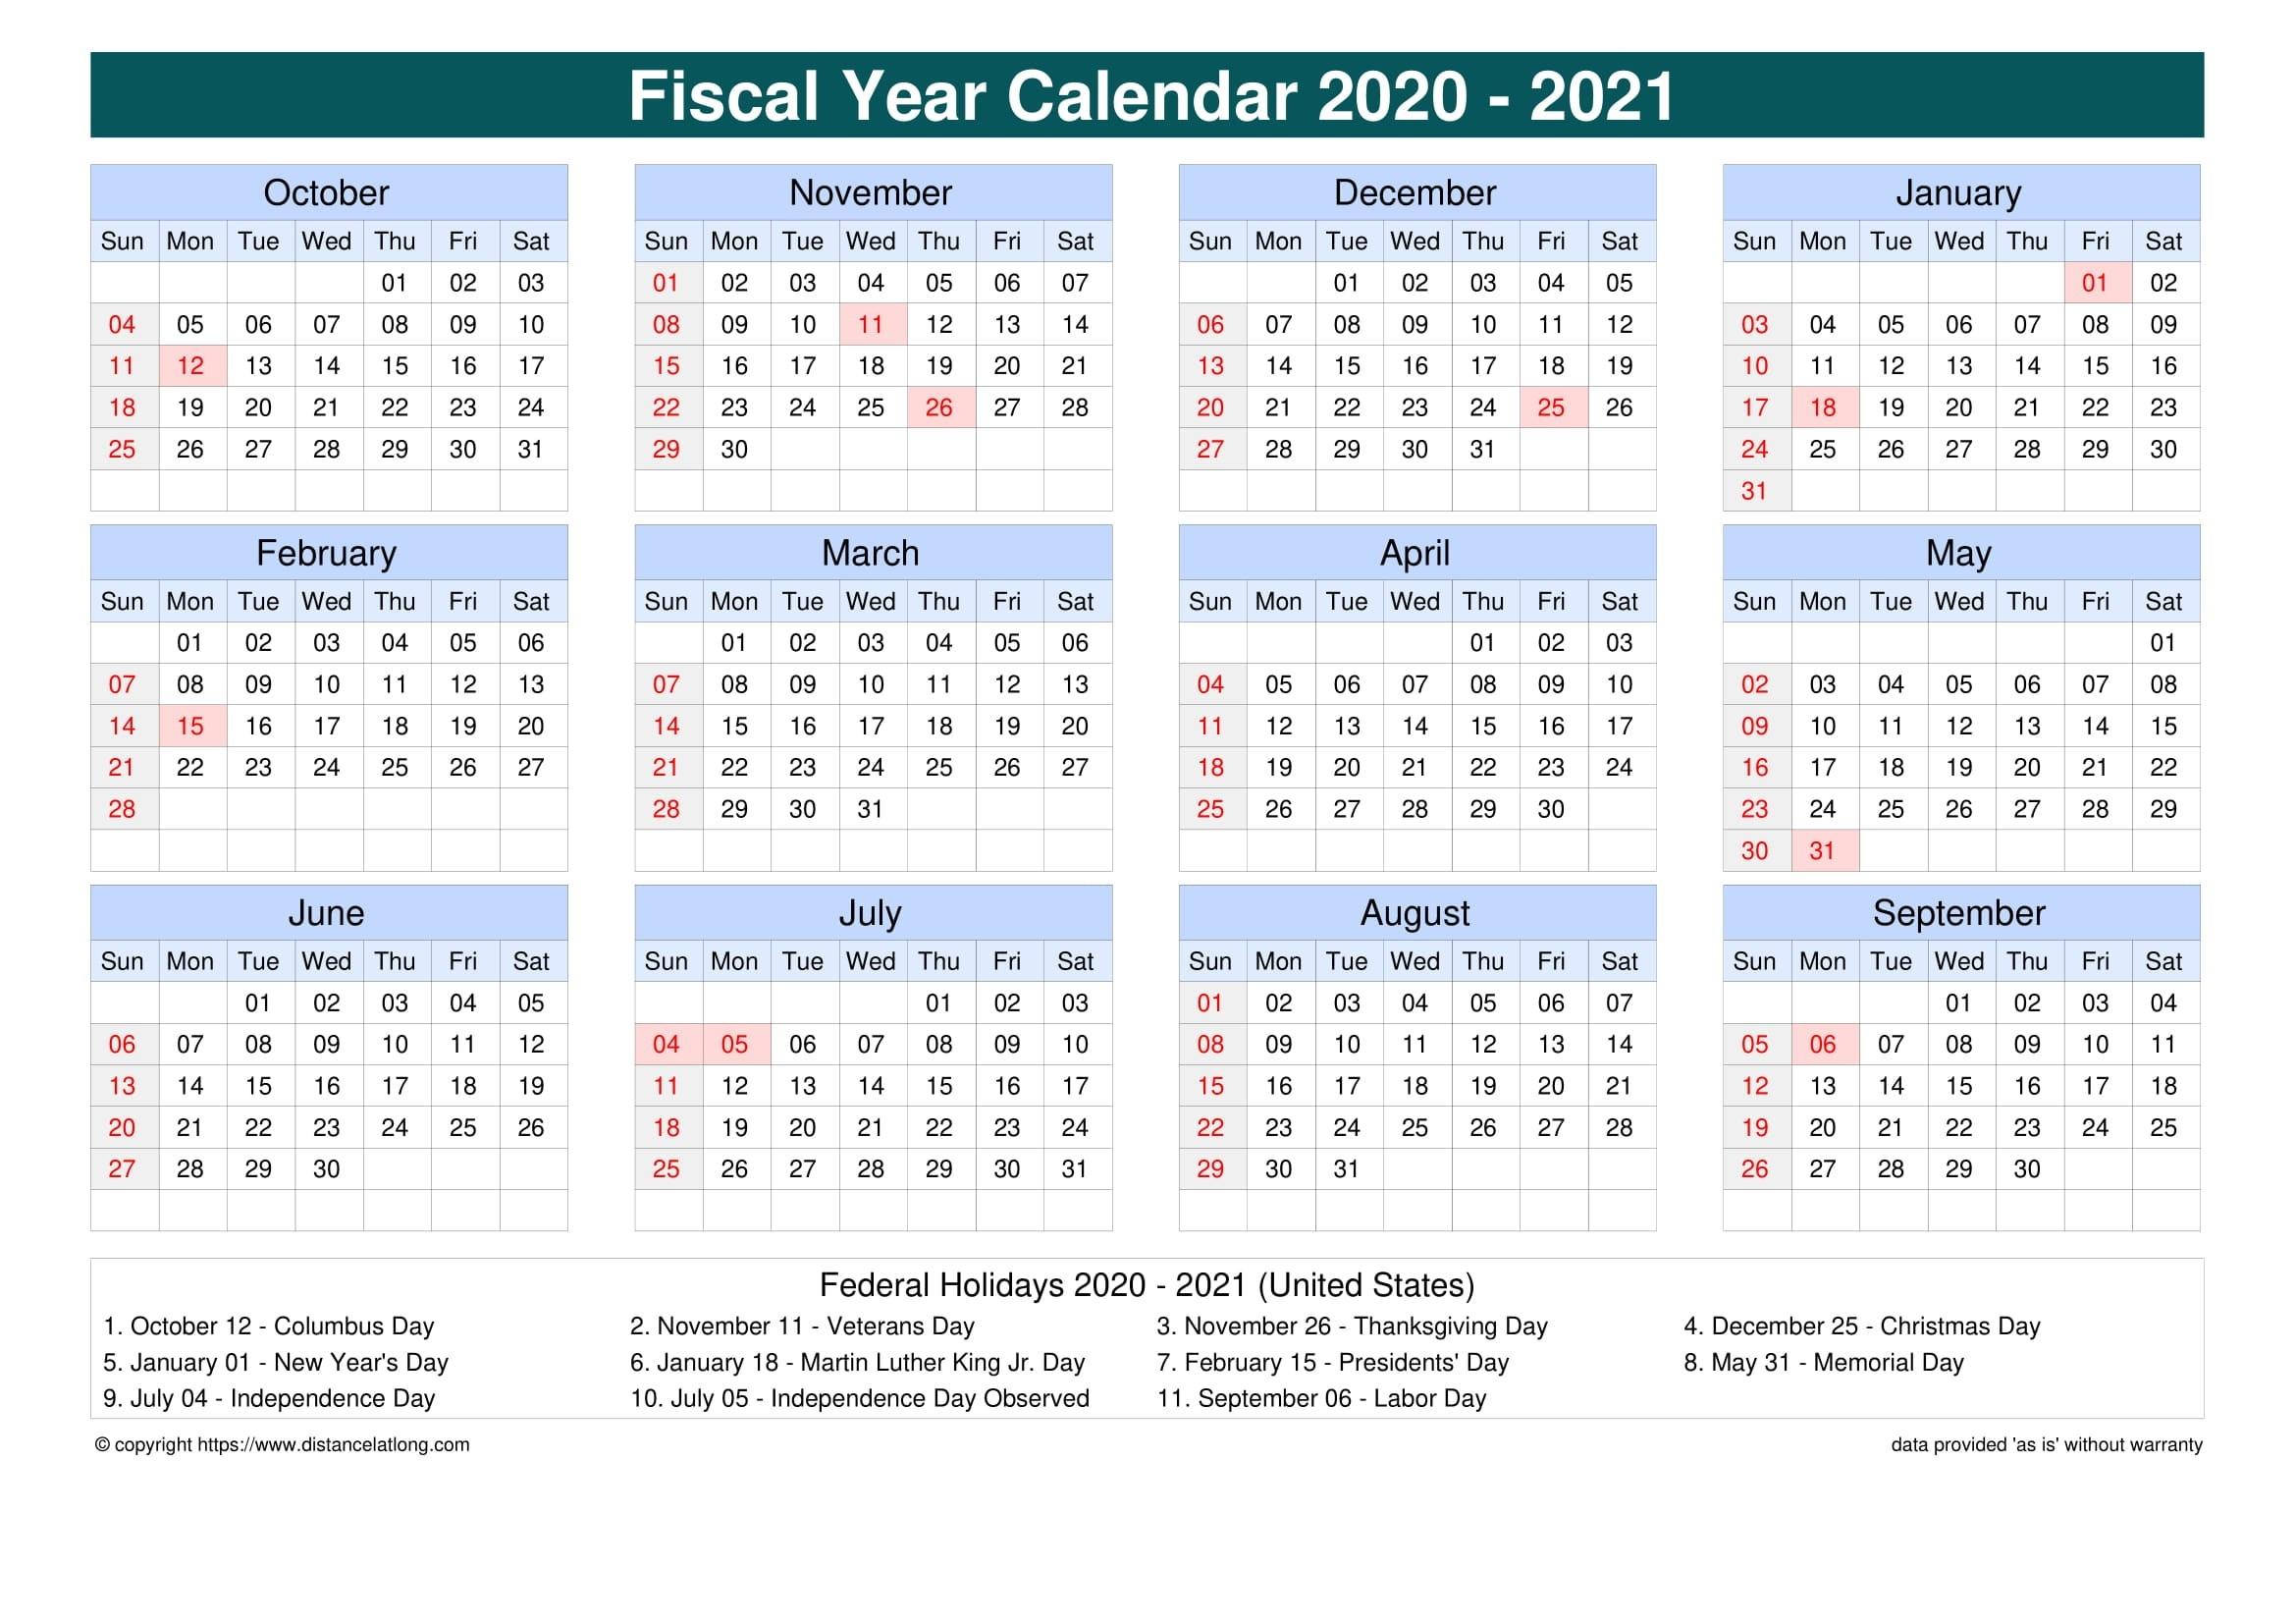 2020 Australia Holiday Calendar Australia Portrait  Calendar 18/19 Financial Year Australia